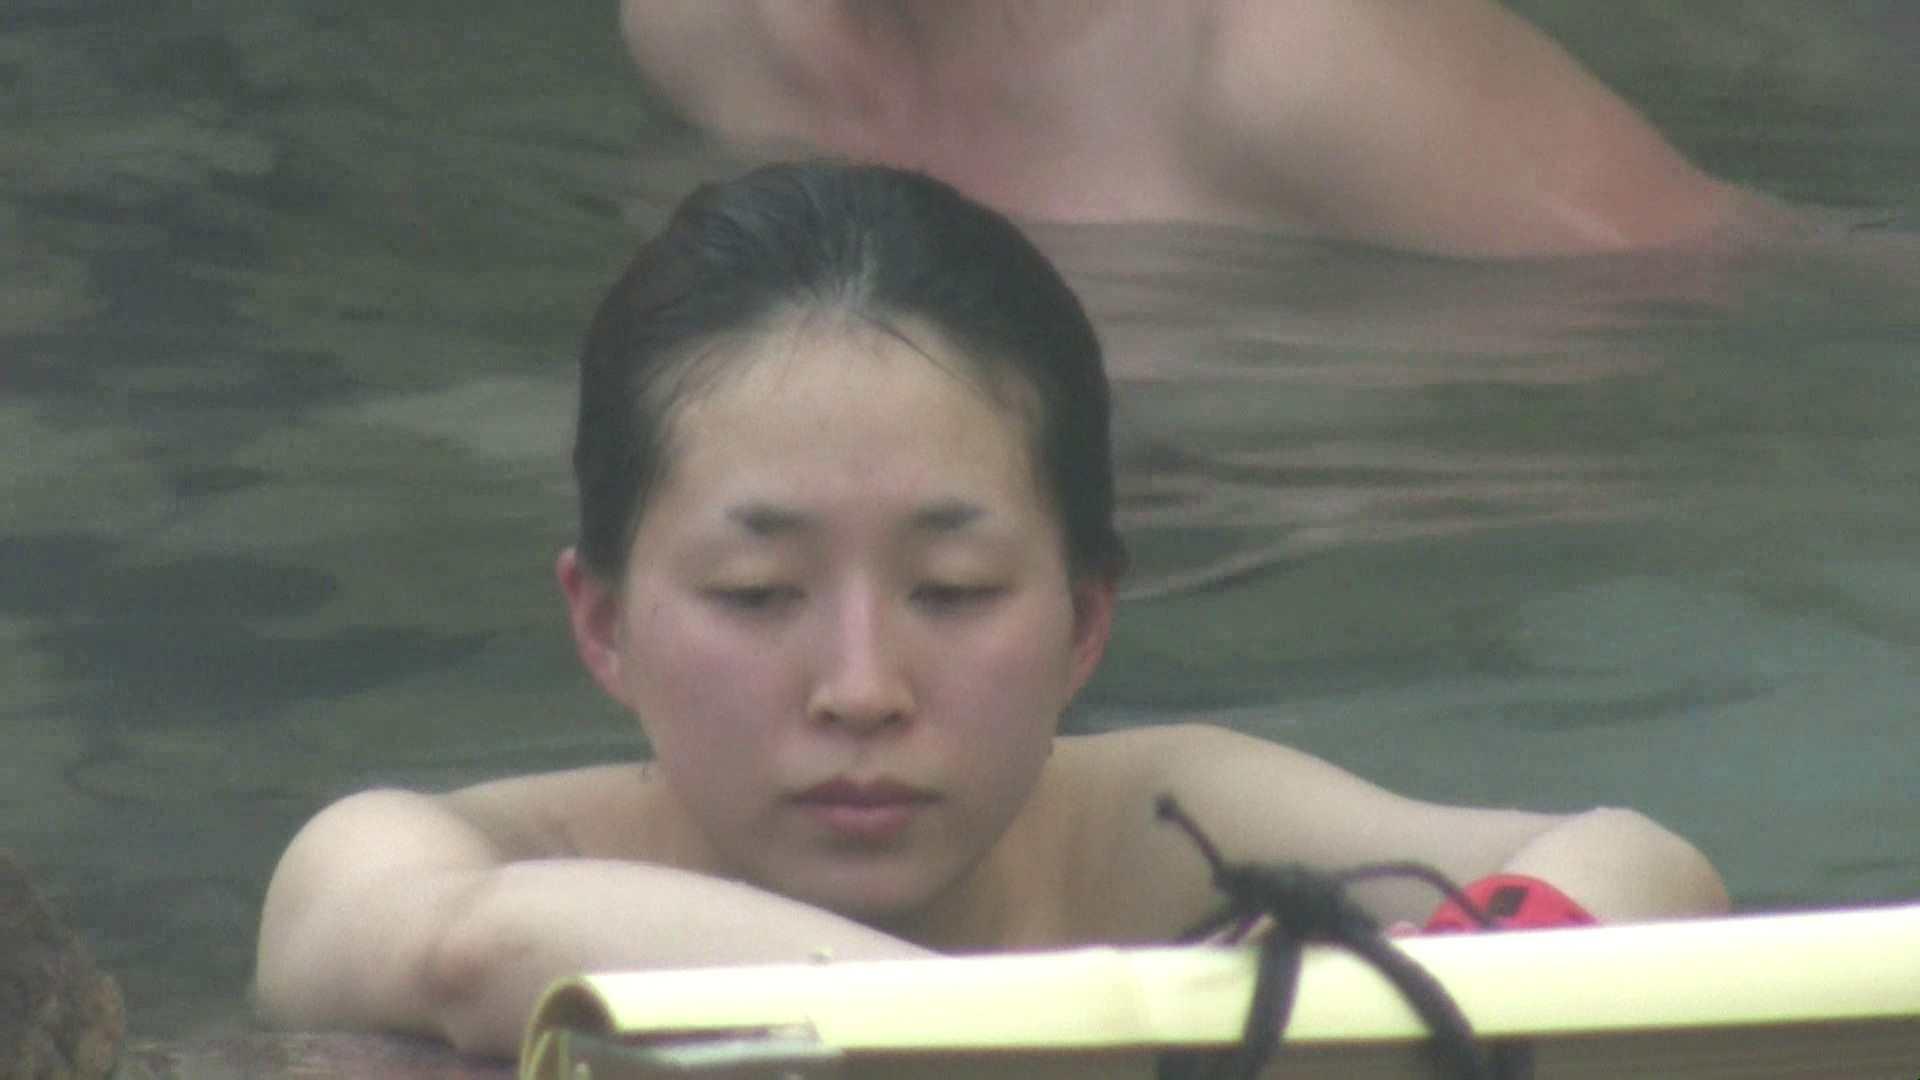 Aquaな露天風呂Vol.583 盗撮シリーズ | 露天風呂編  97PIX 59